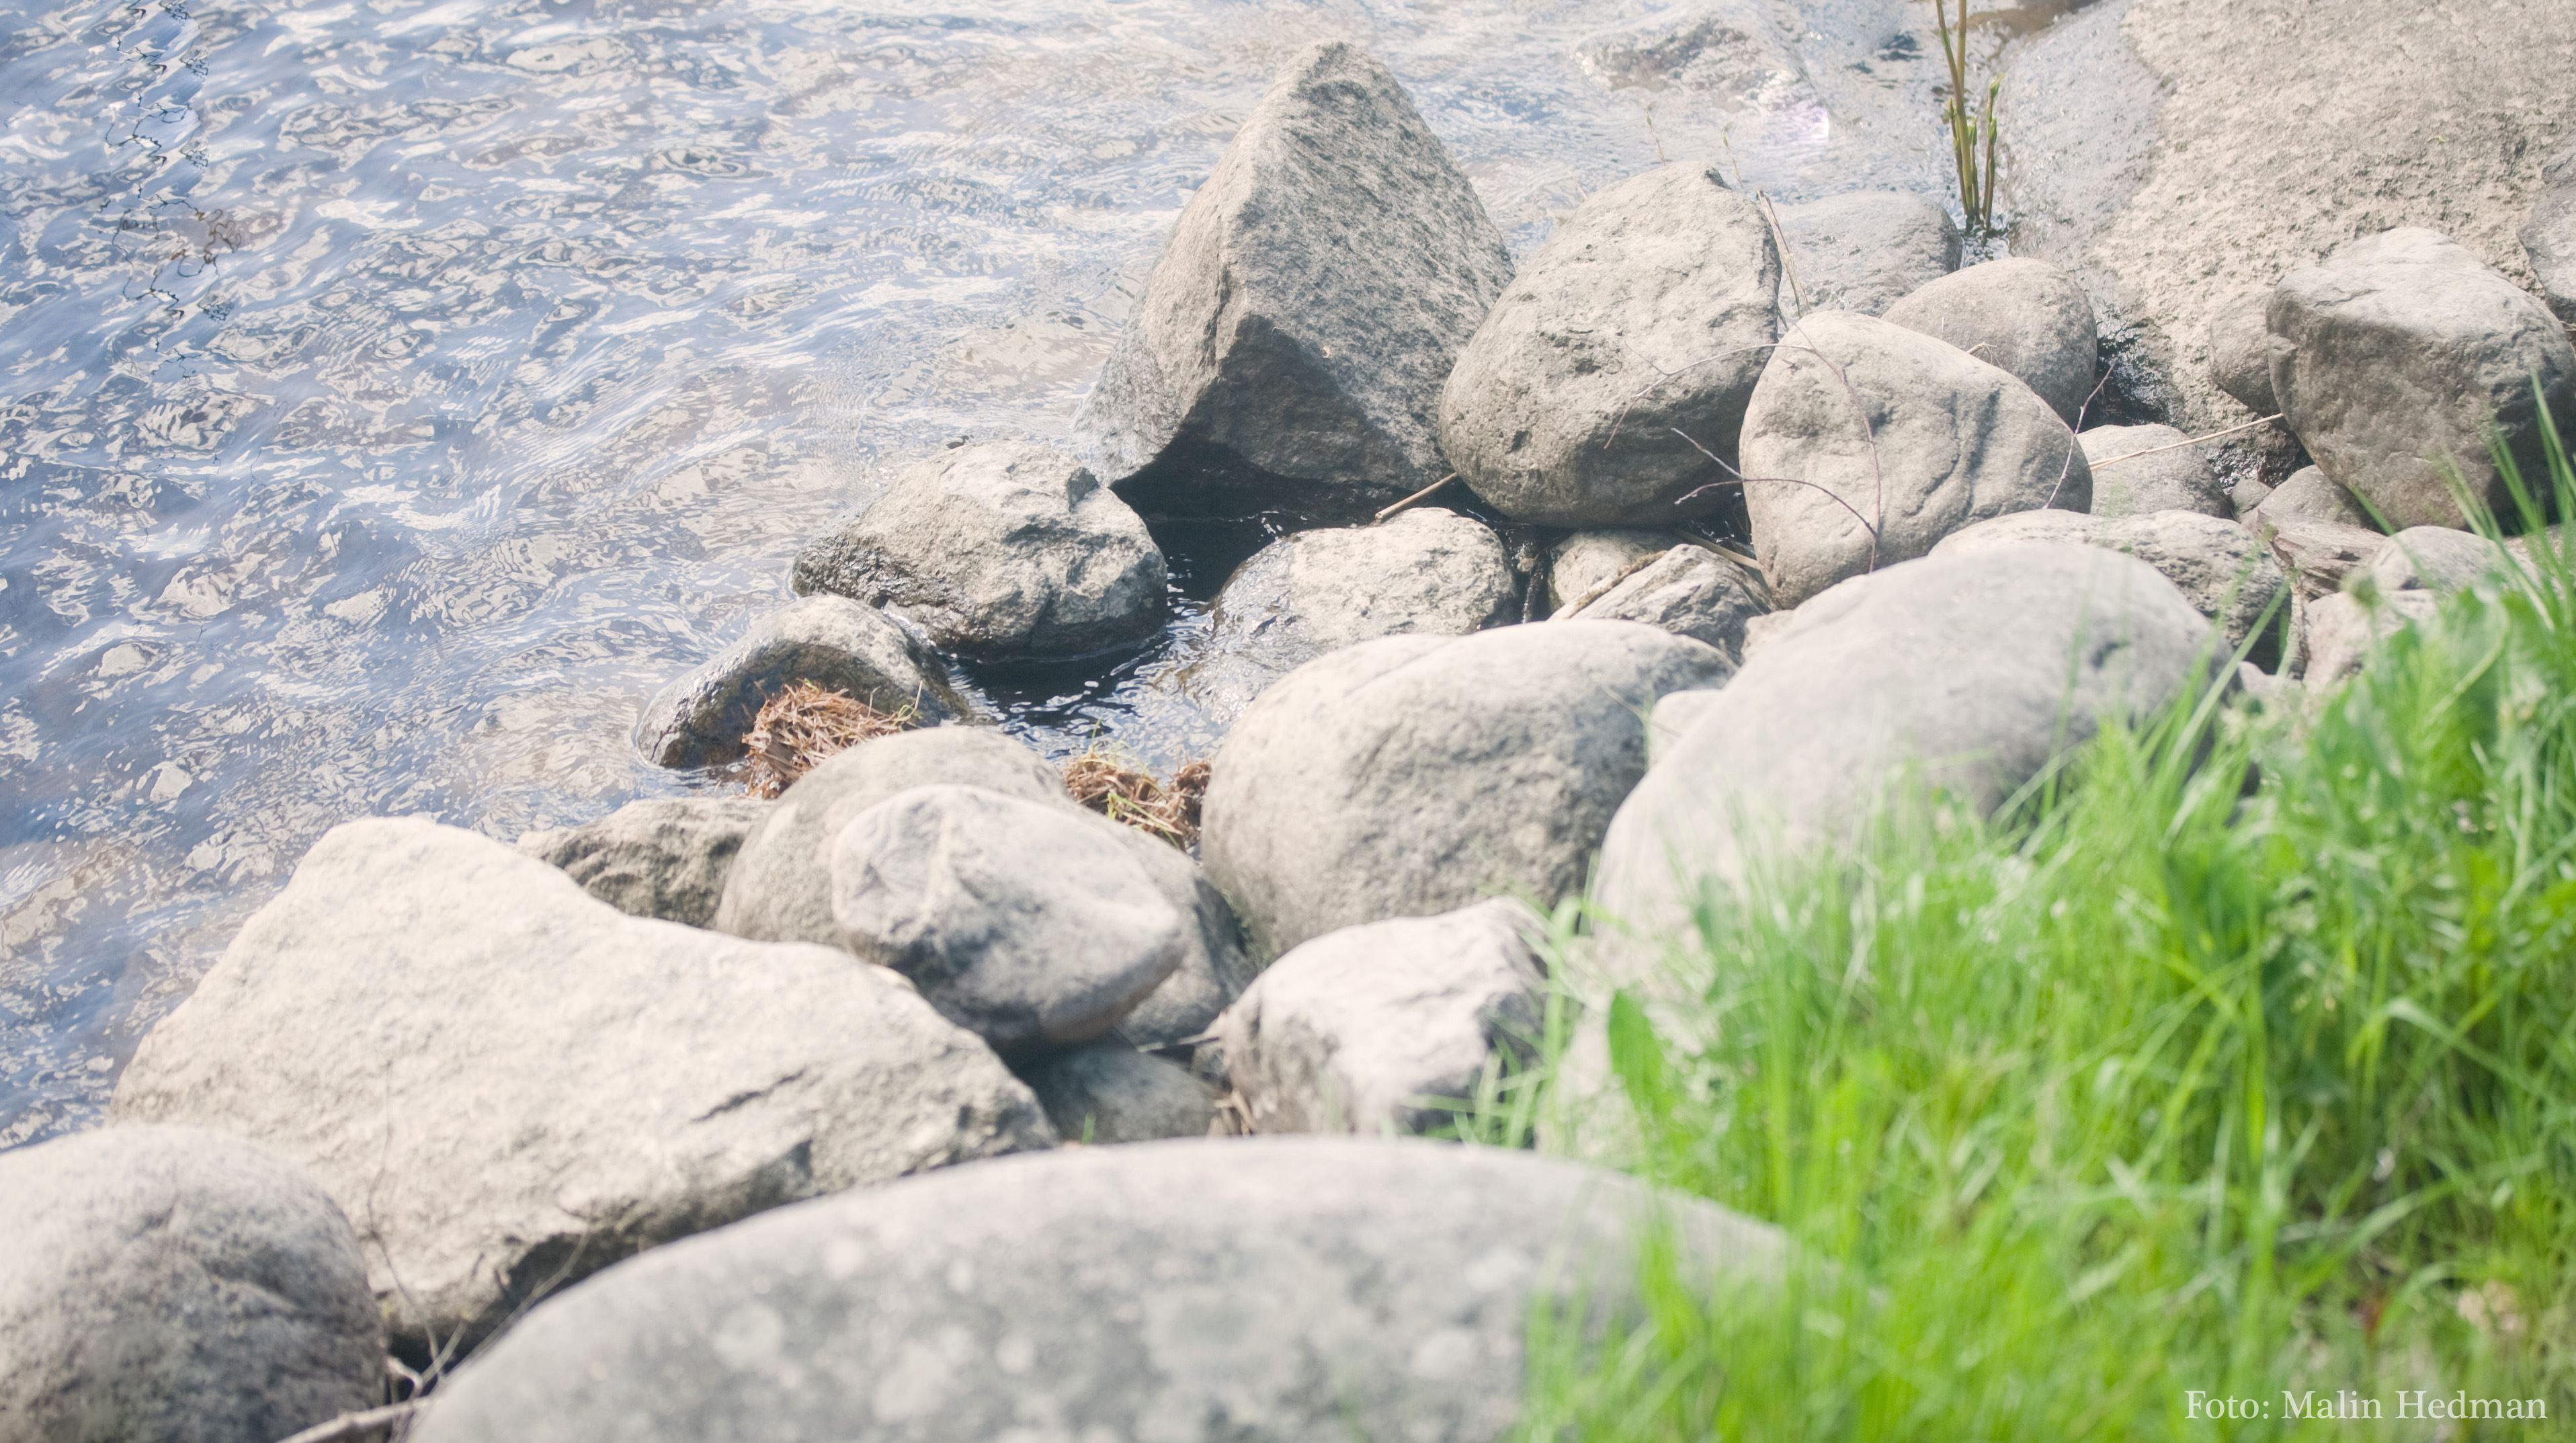 Skellefte älvs gamla fåra